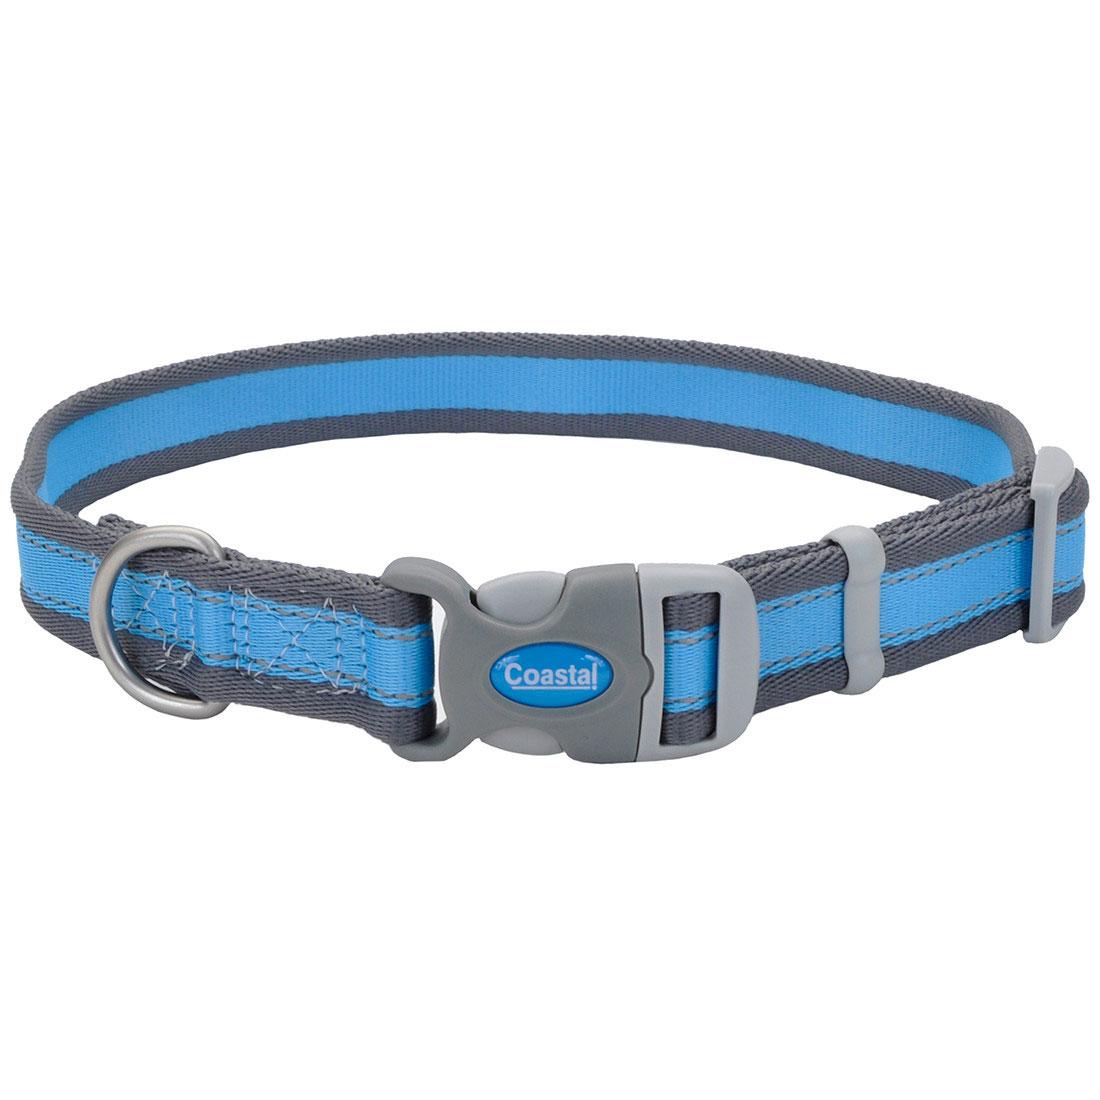 Pro Reflective Adjustable Dog Collar, Bright Blue with Grey Image